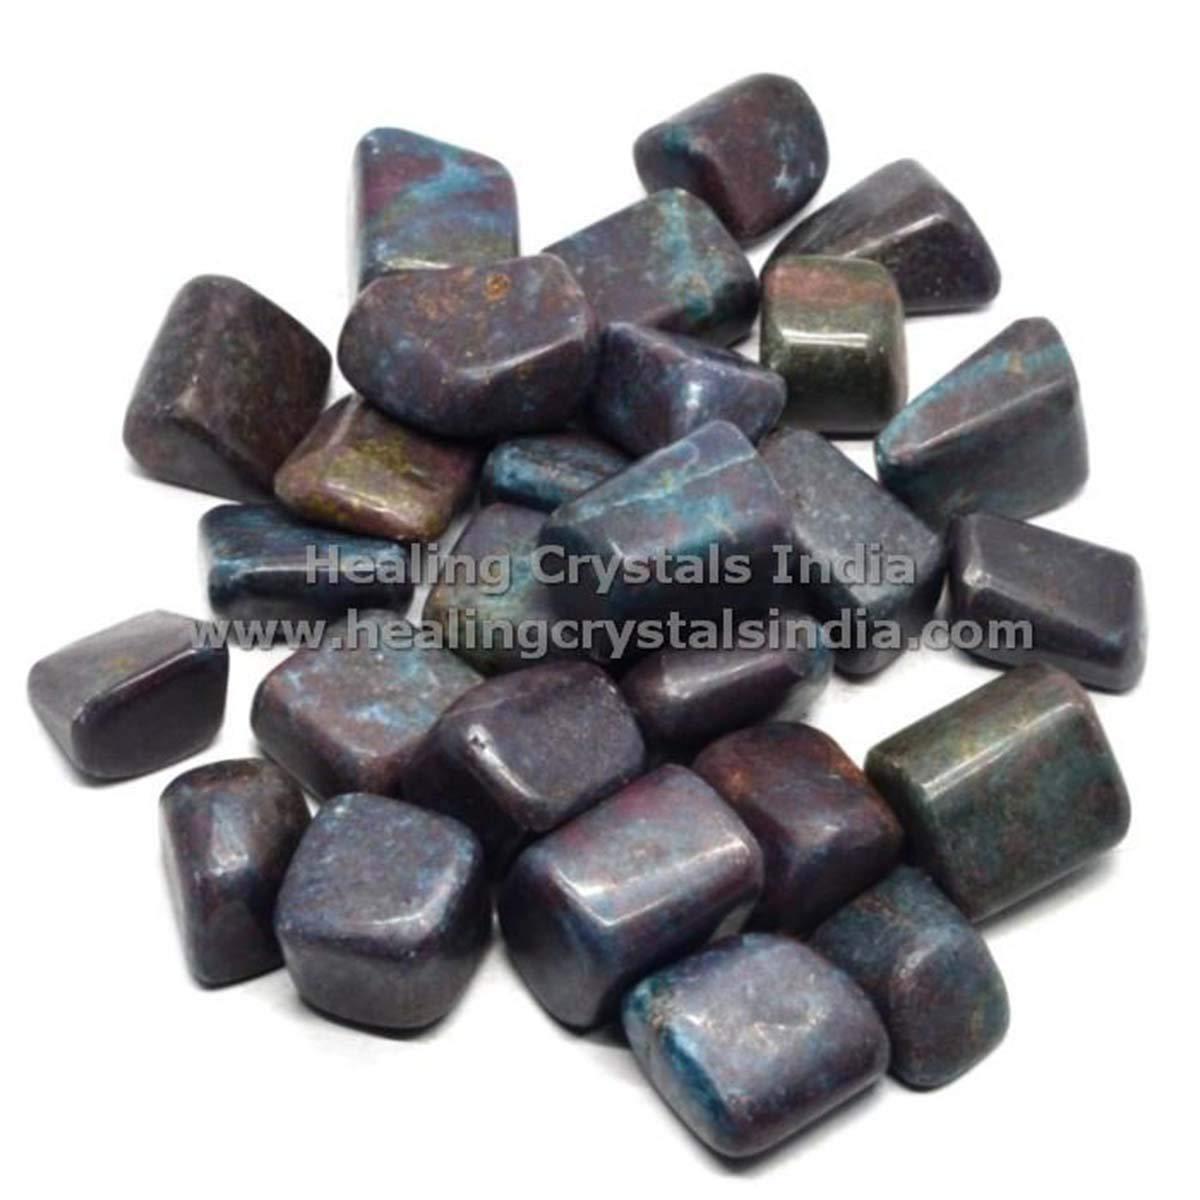 Indian Handicrafts Export 1lb Natural Ruby Kynite Stone Tumble HCS0683